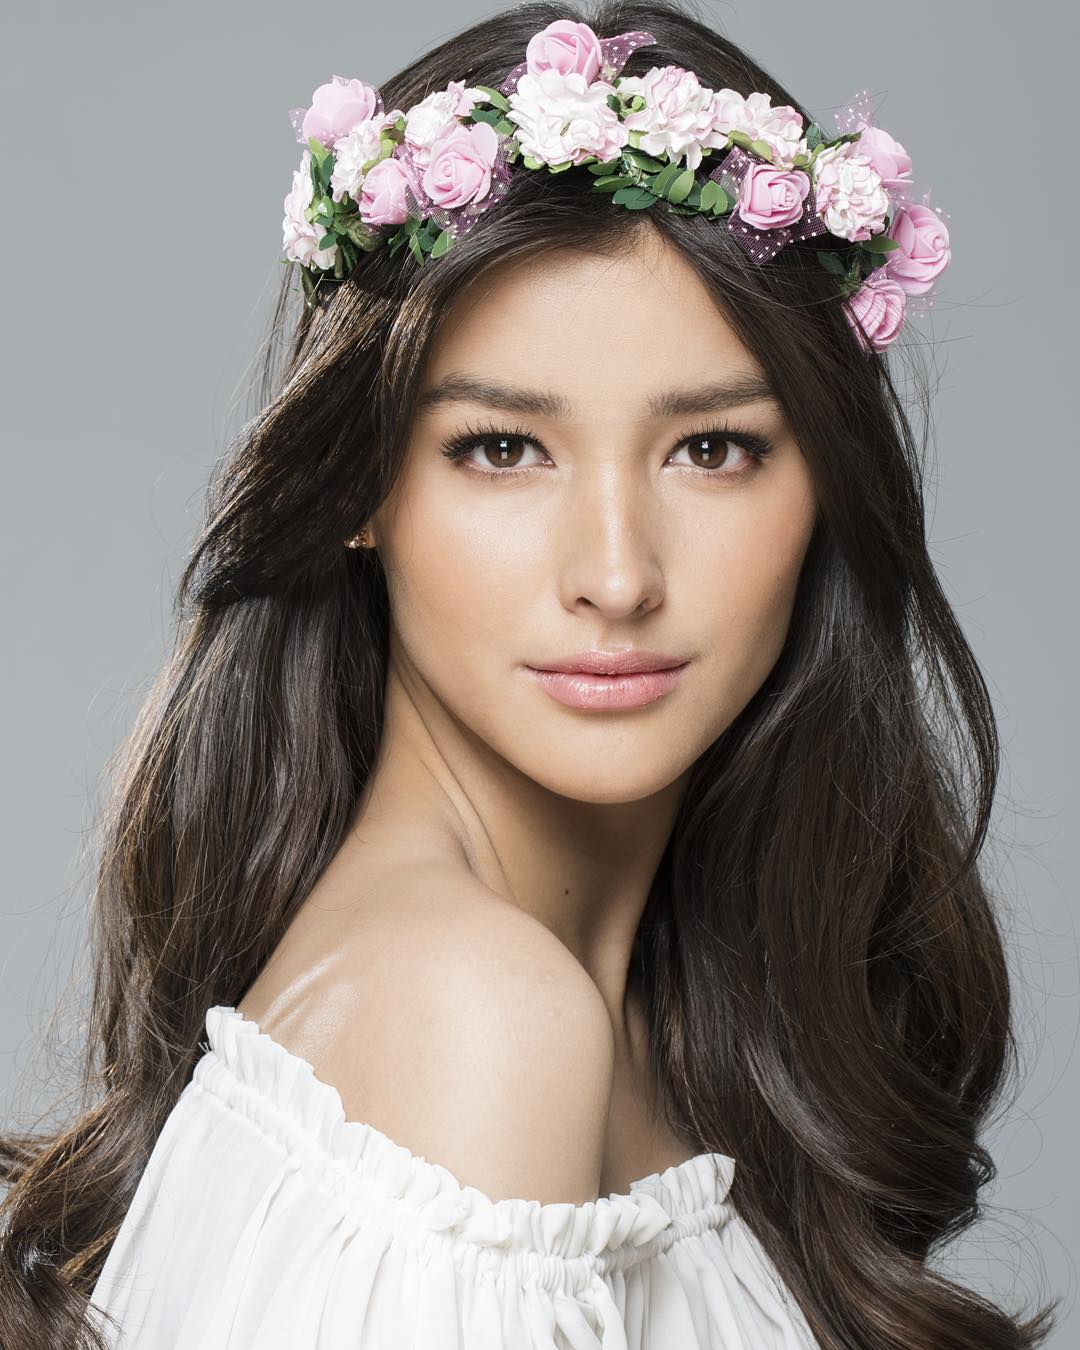 Filipino actress Liza Soberano Image via wethepvbliccom